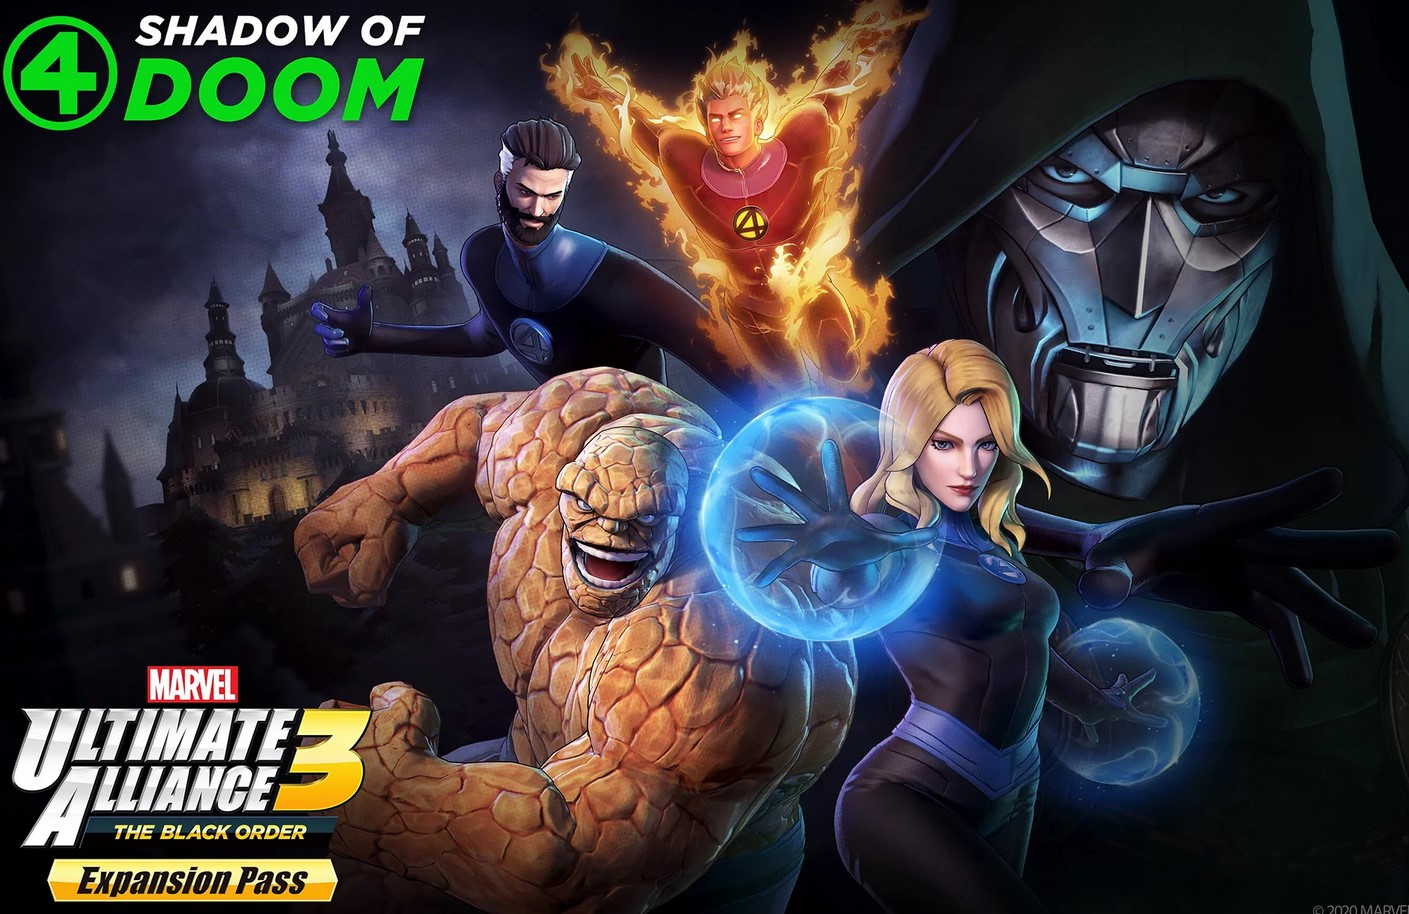 Marvel Ultimate Alliance 3 Shadow of Doom